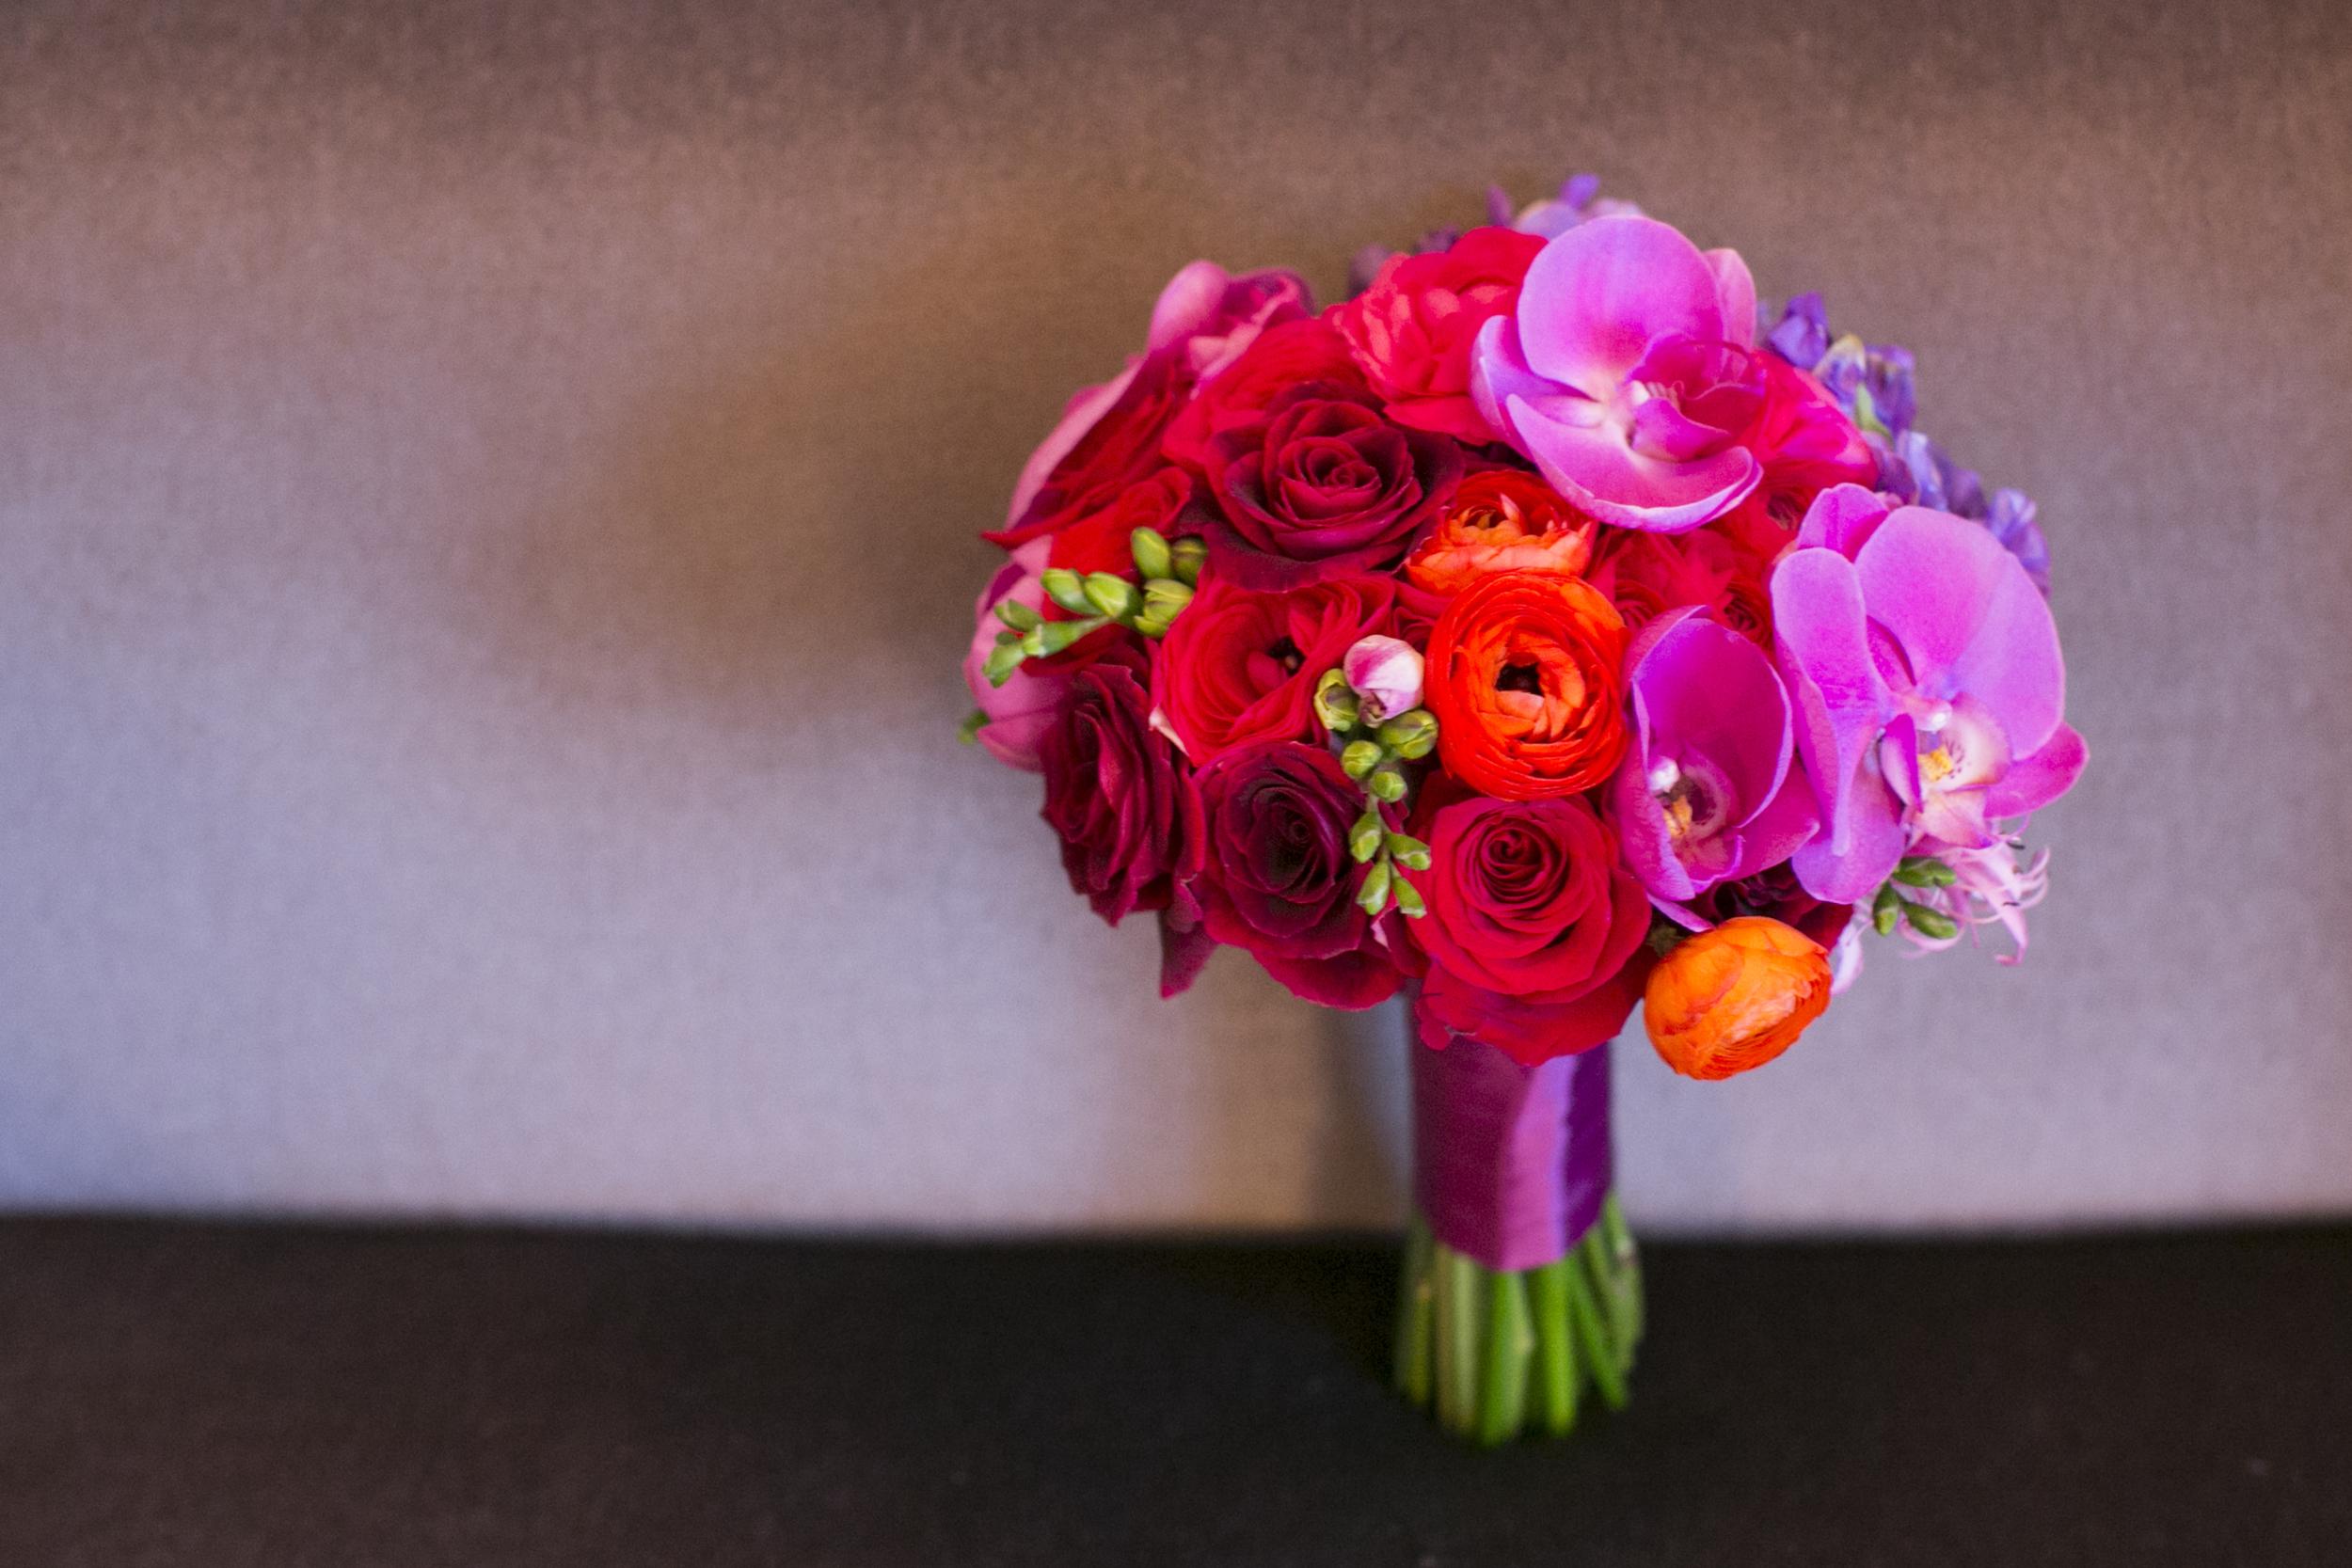 NYC-Wedding-Planner-Andrea-Freeman-Events-Mandarin-Oriental-2.jpg